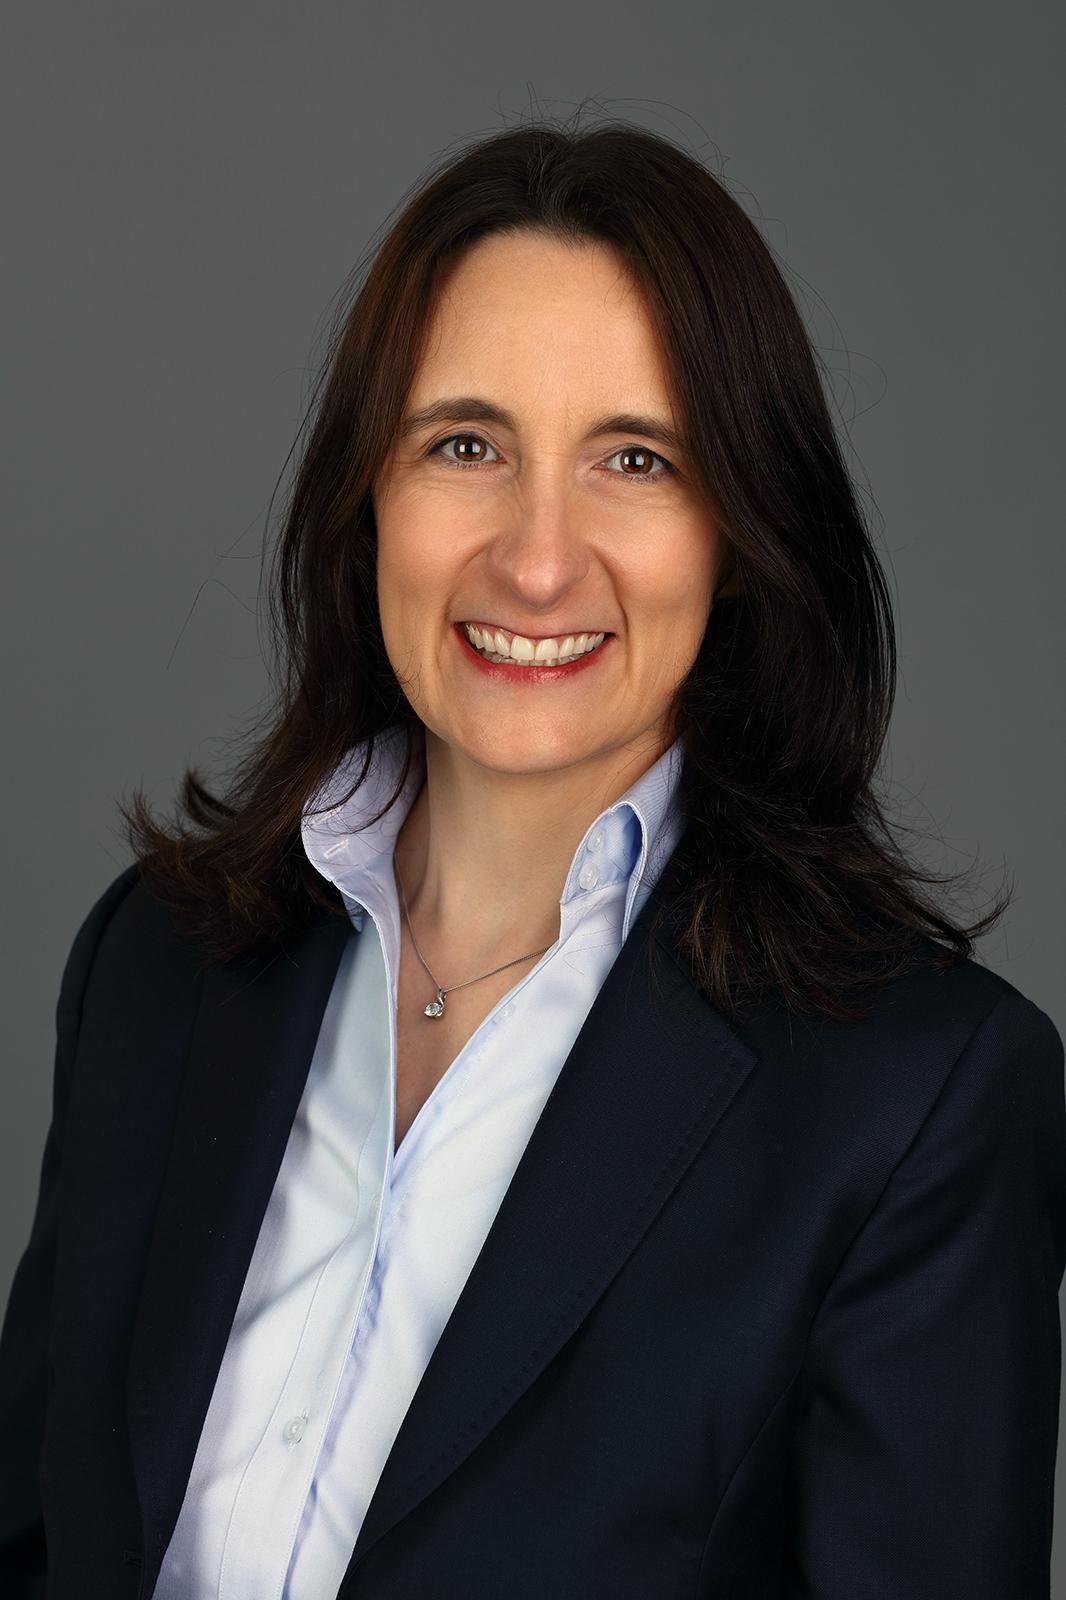 Carmen Häusler